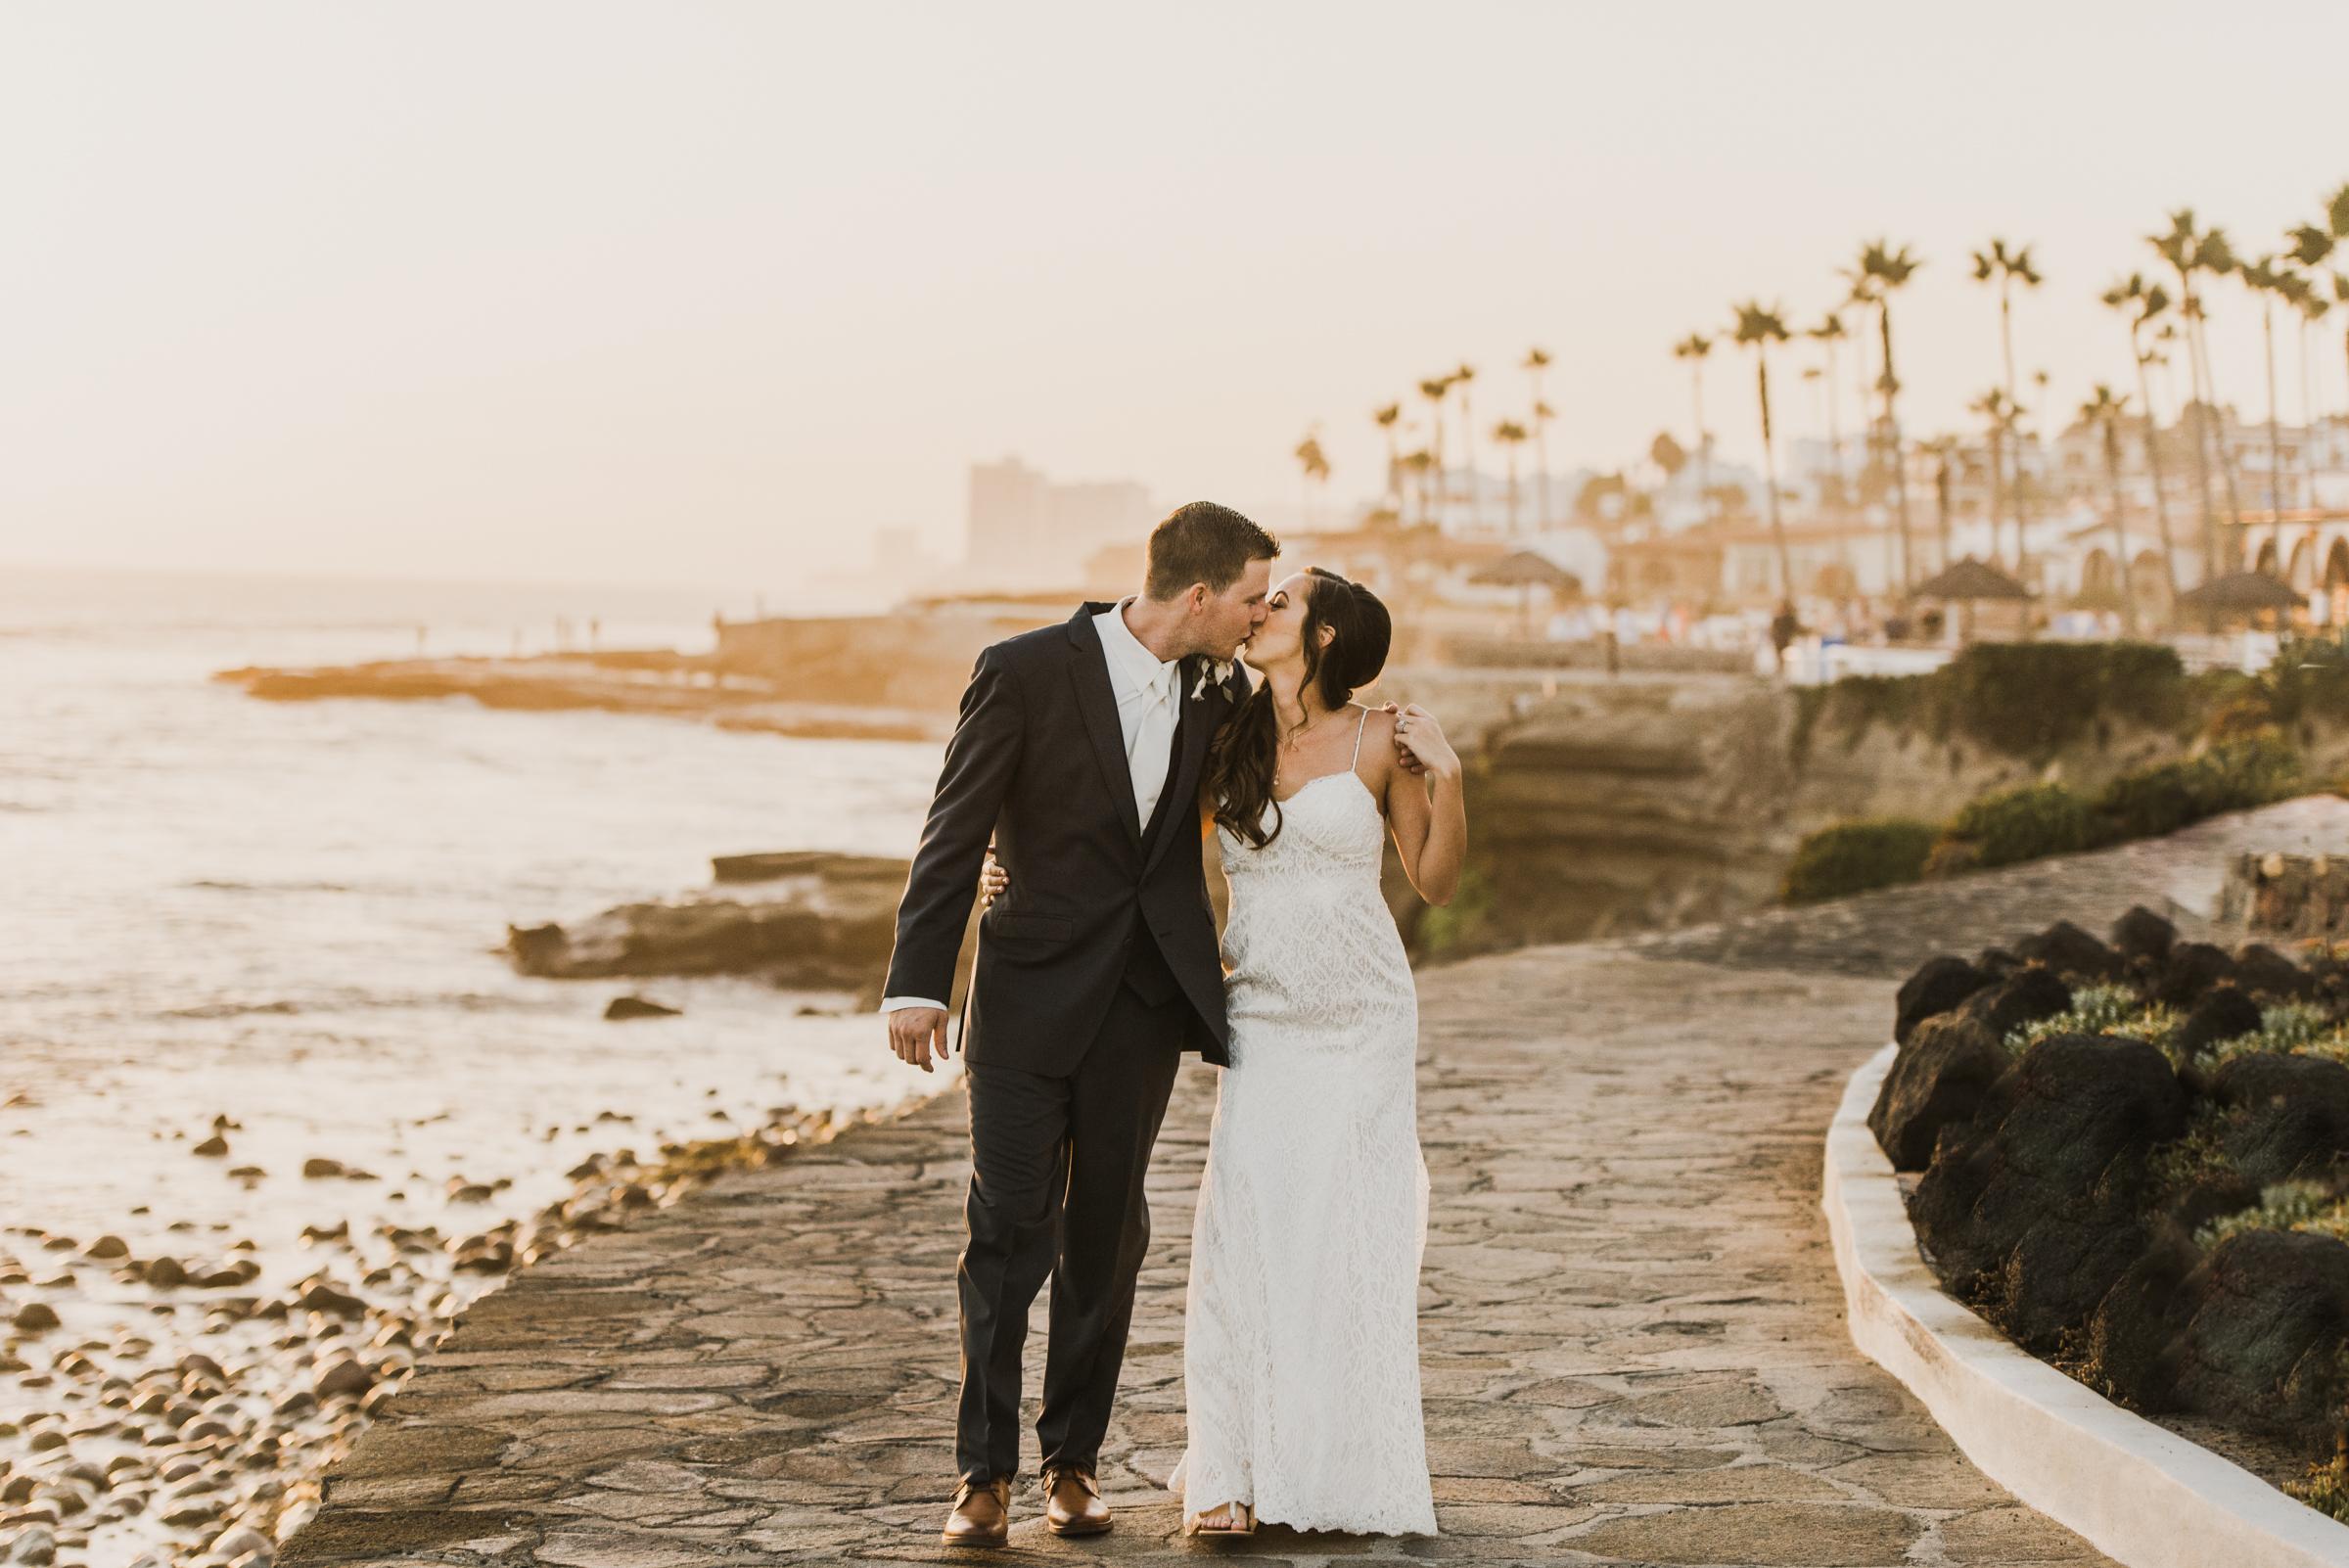 ©Isaiah + Taylor Photography - Rosarito Beach Destination Wedding, Mexico-0089.jpg